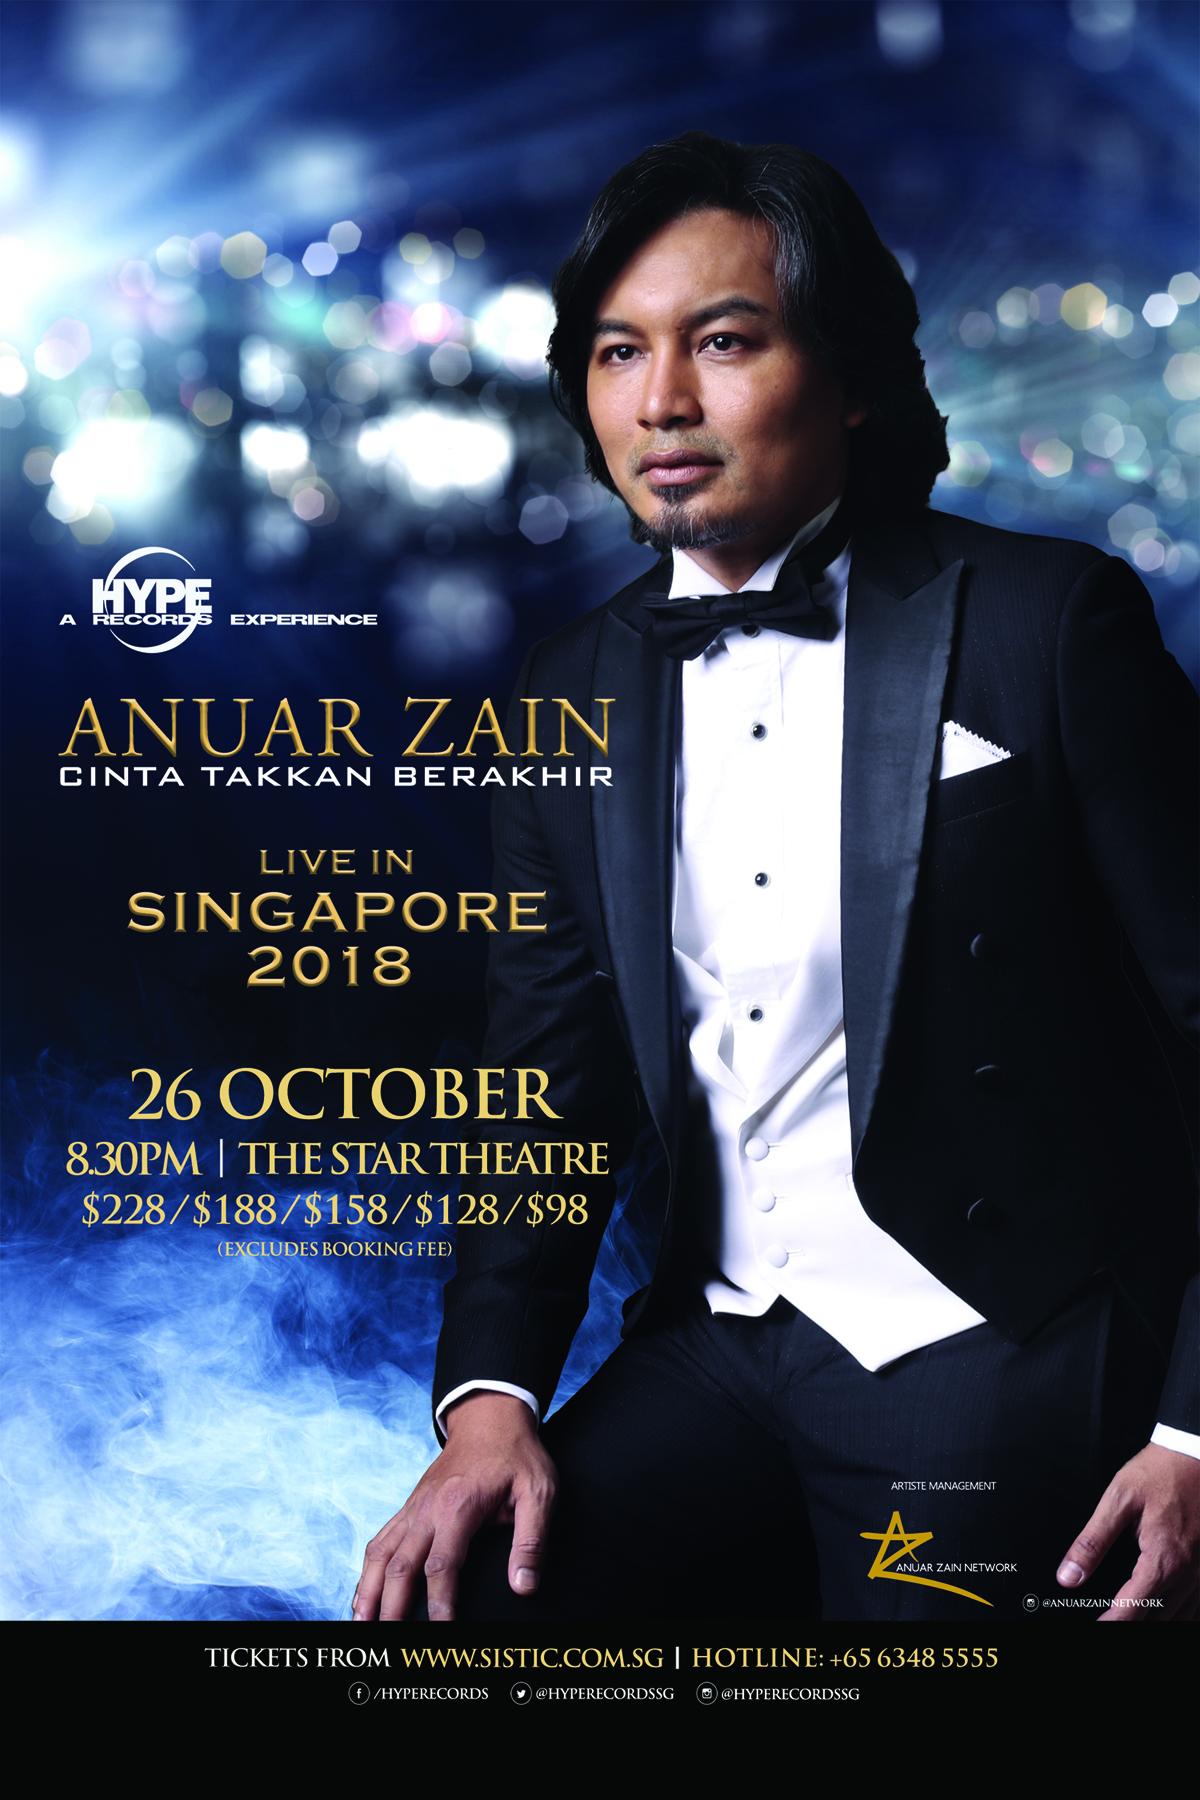 Anuar Zain 'Cinta Takkan Berakhir' Live In Singapore 2018